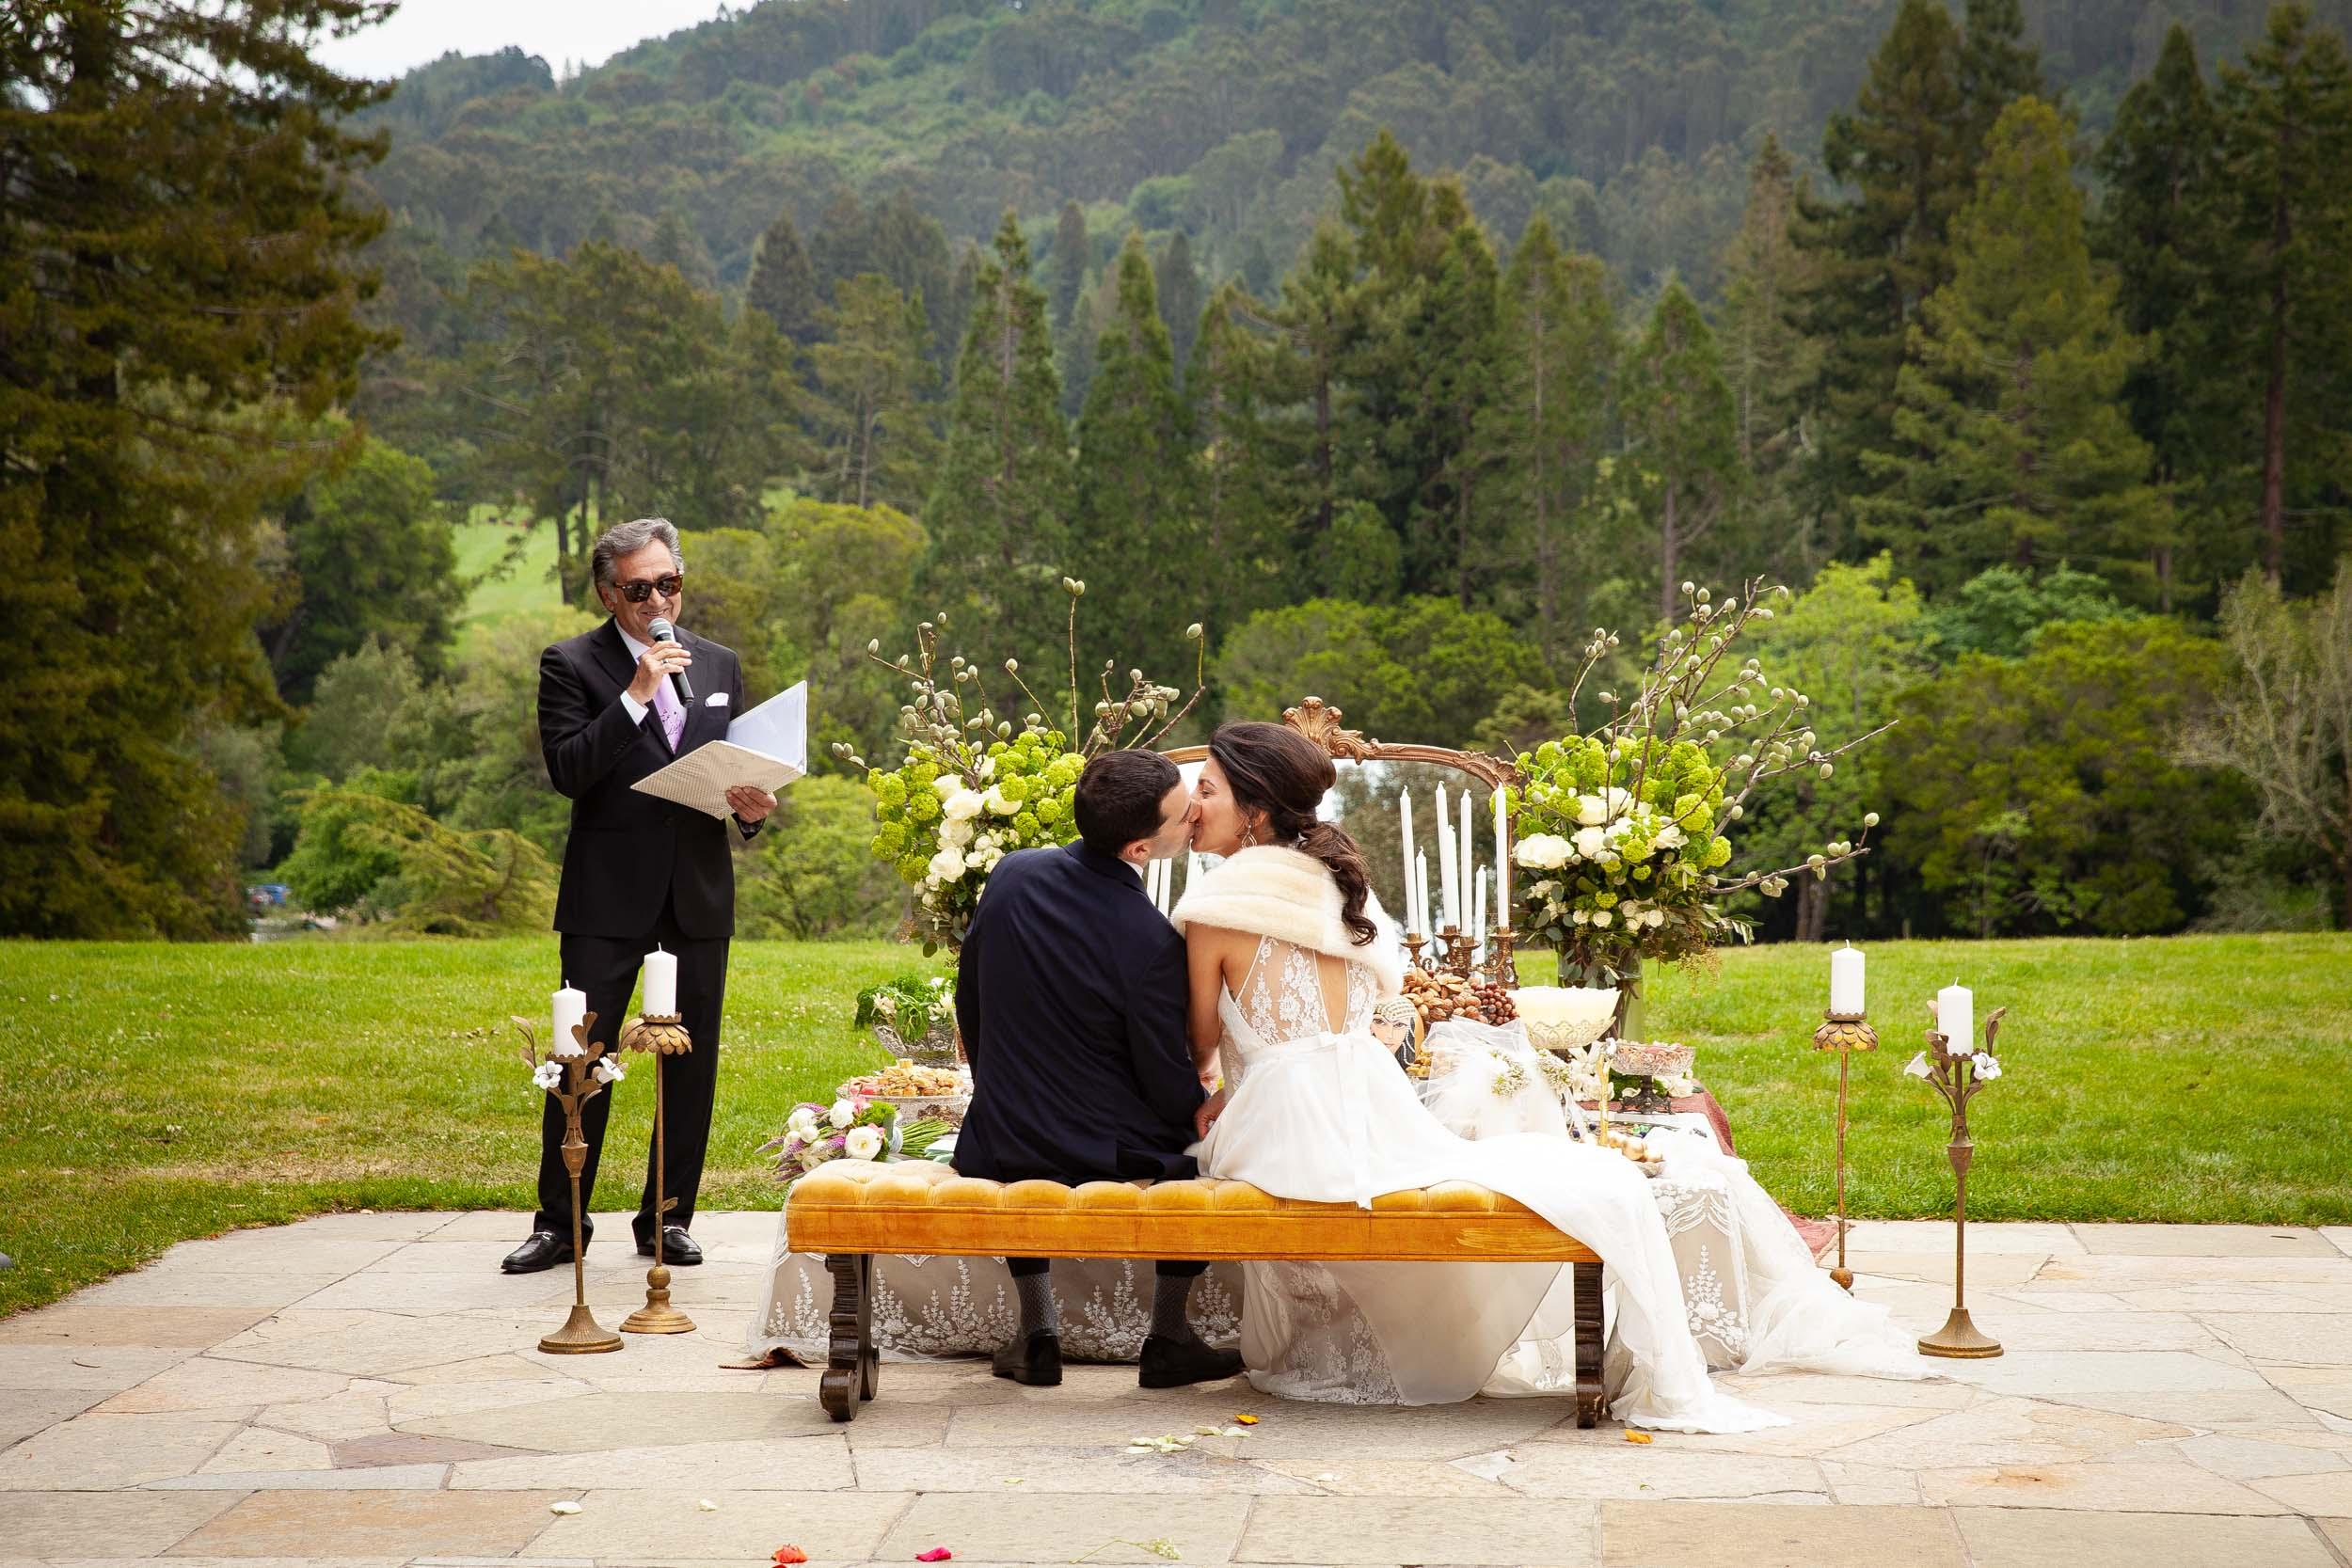 Brazilian-Room-wedding-Persian-ceremony-64.jpg